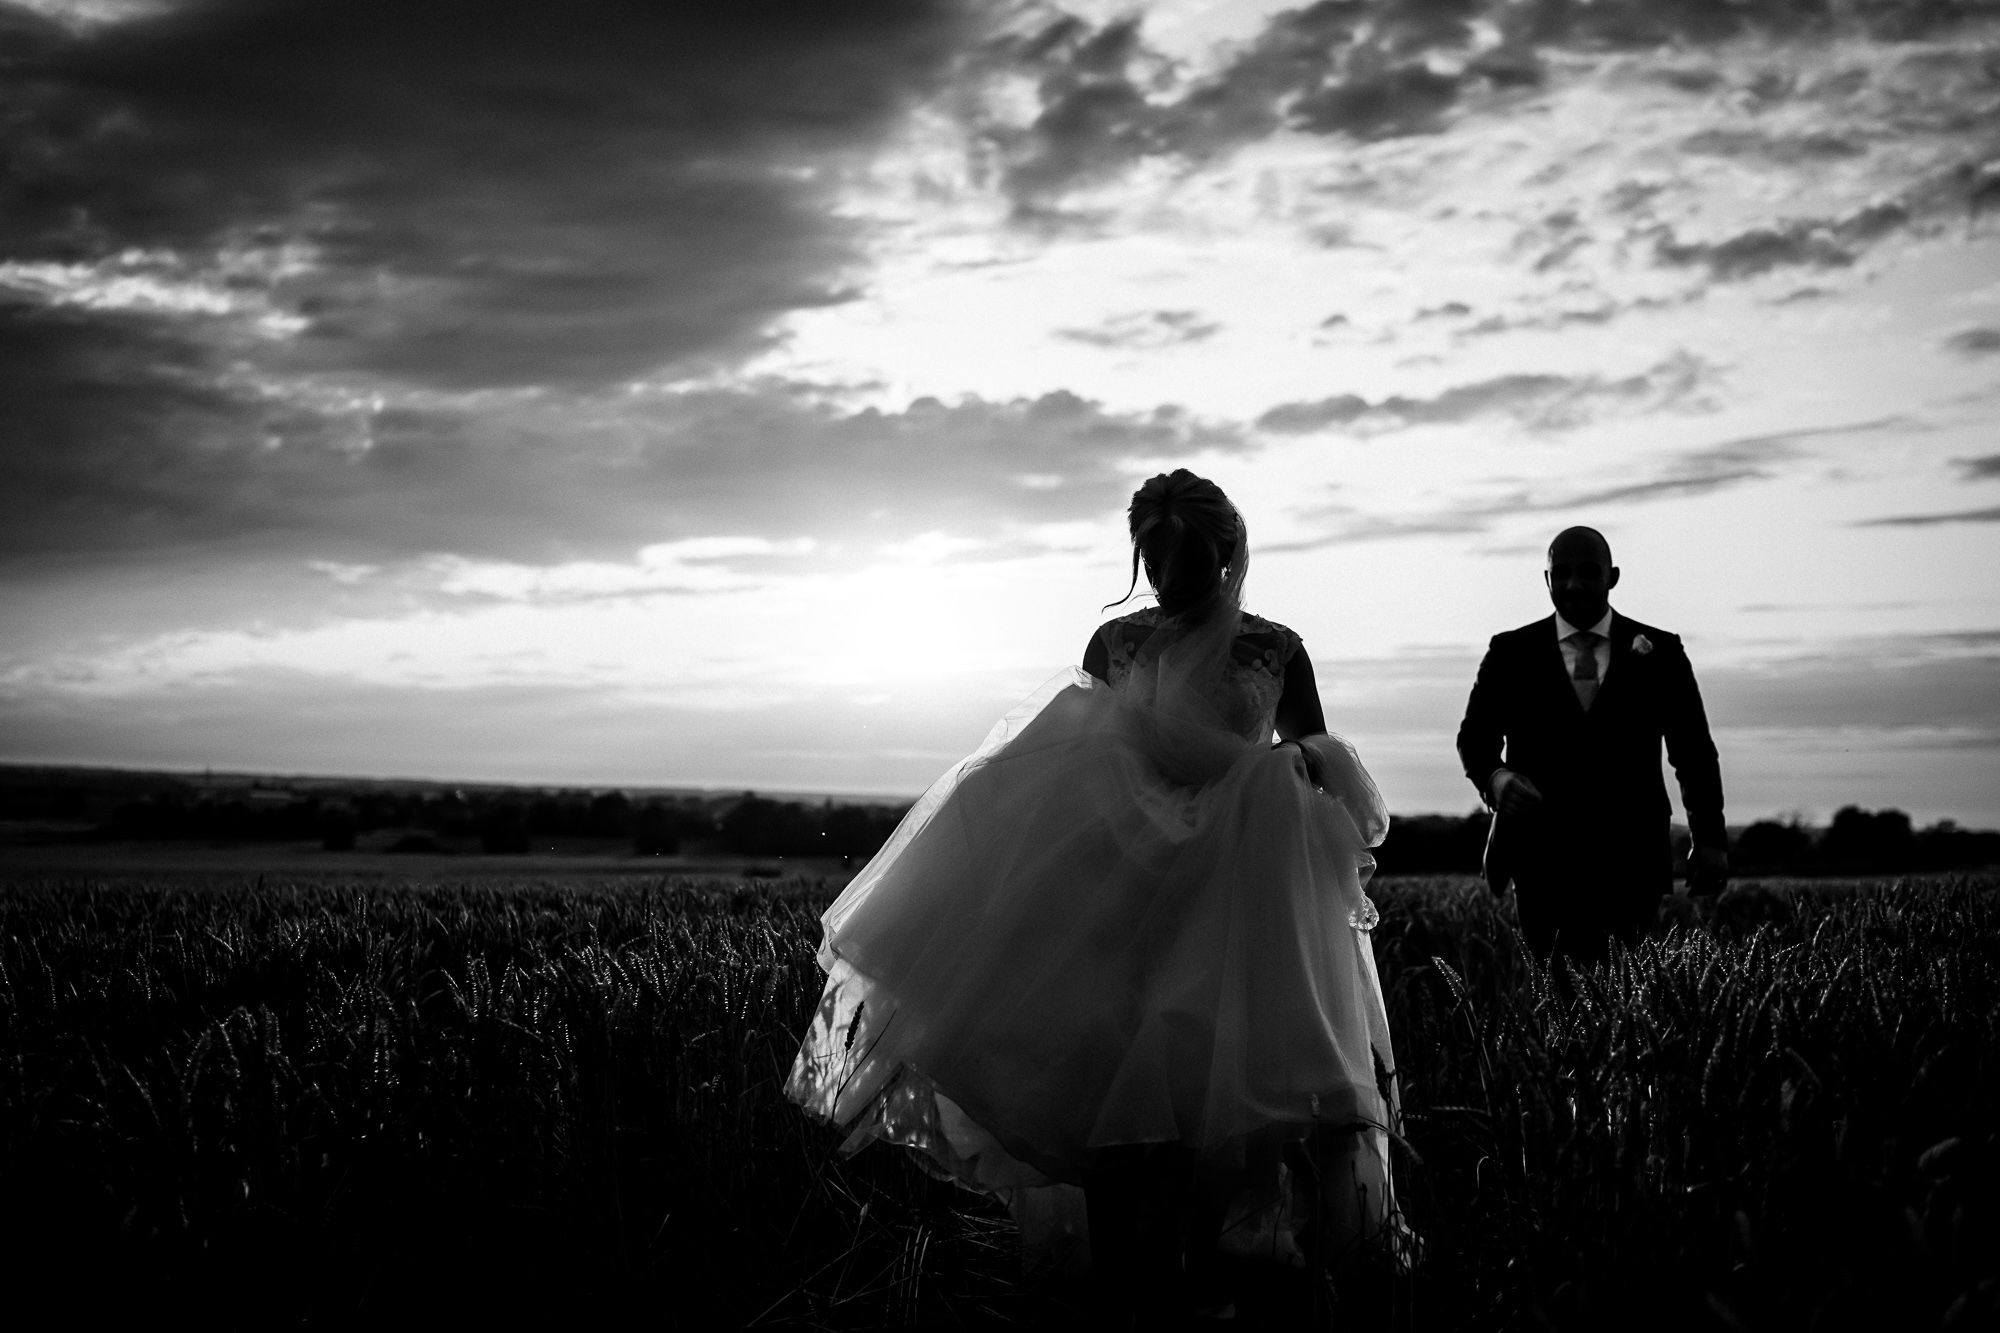 West Tower Wedding Photographer Ormskirk Lancashire wedding photography (52 of 57).jpg